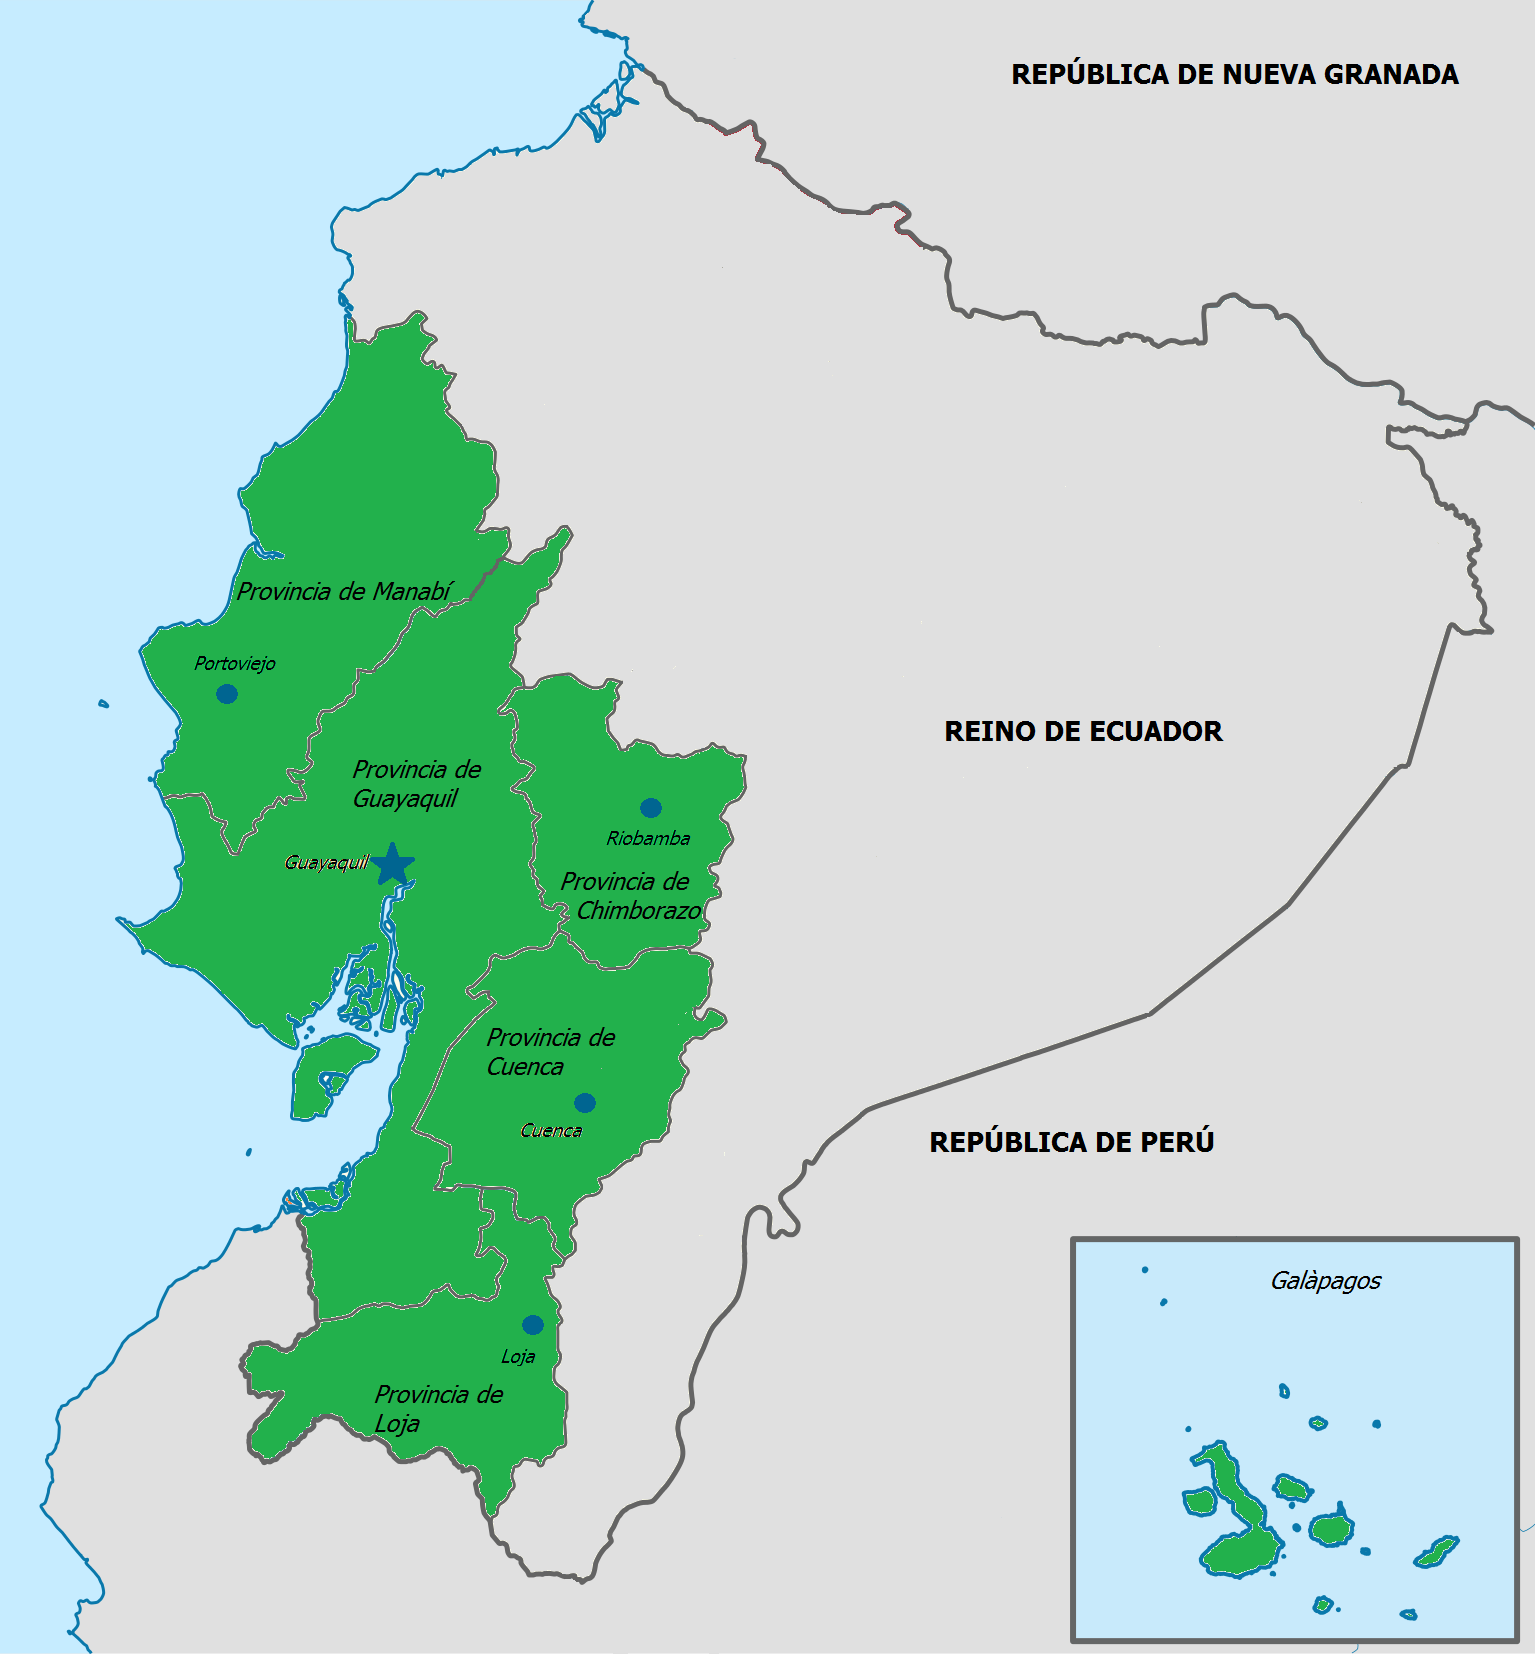 Imagen mapa de la repblica unida de guayaquil y cuencag resolucin original gumiabroncs Images